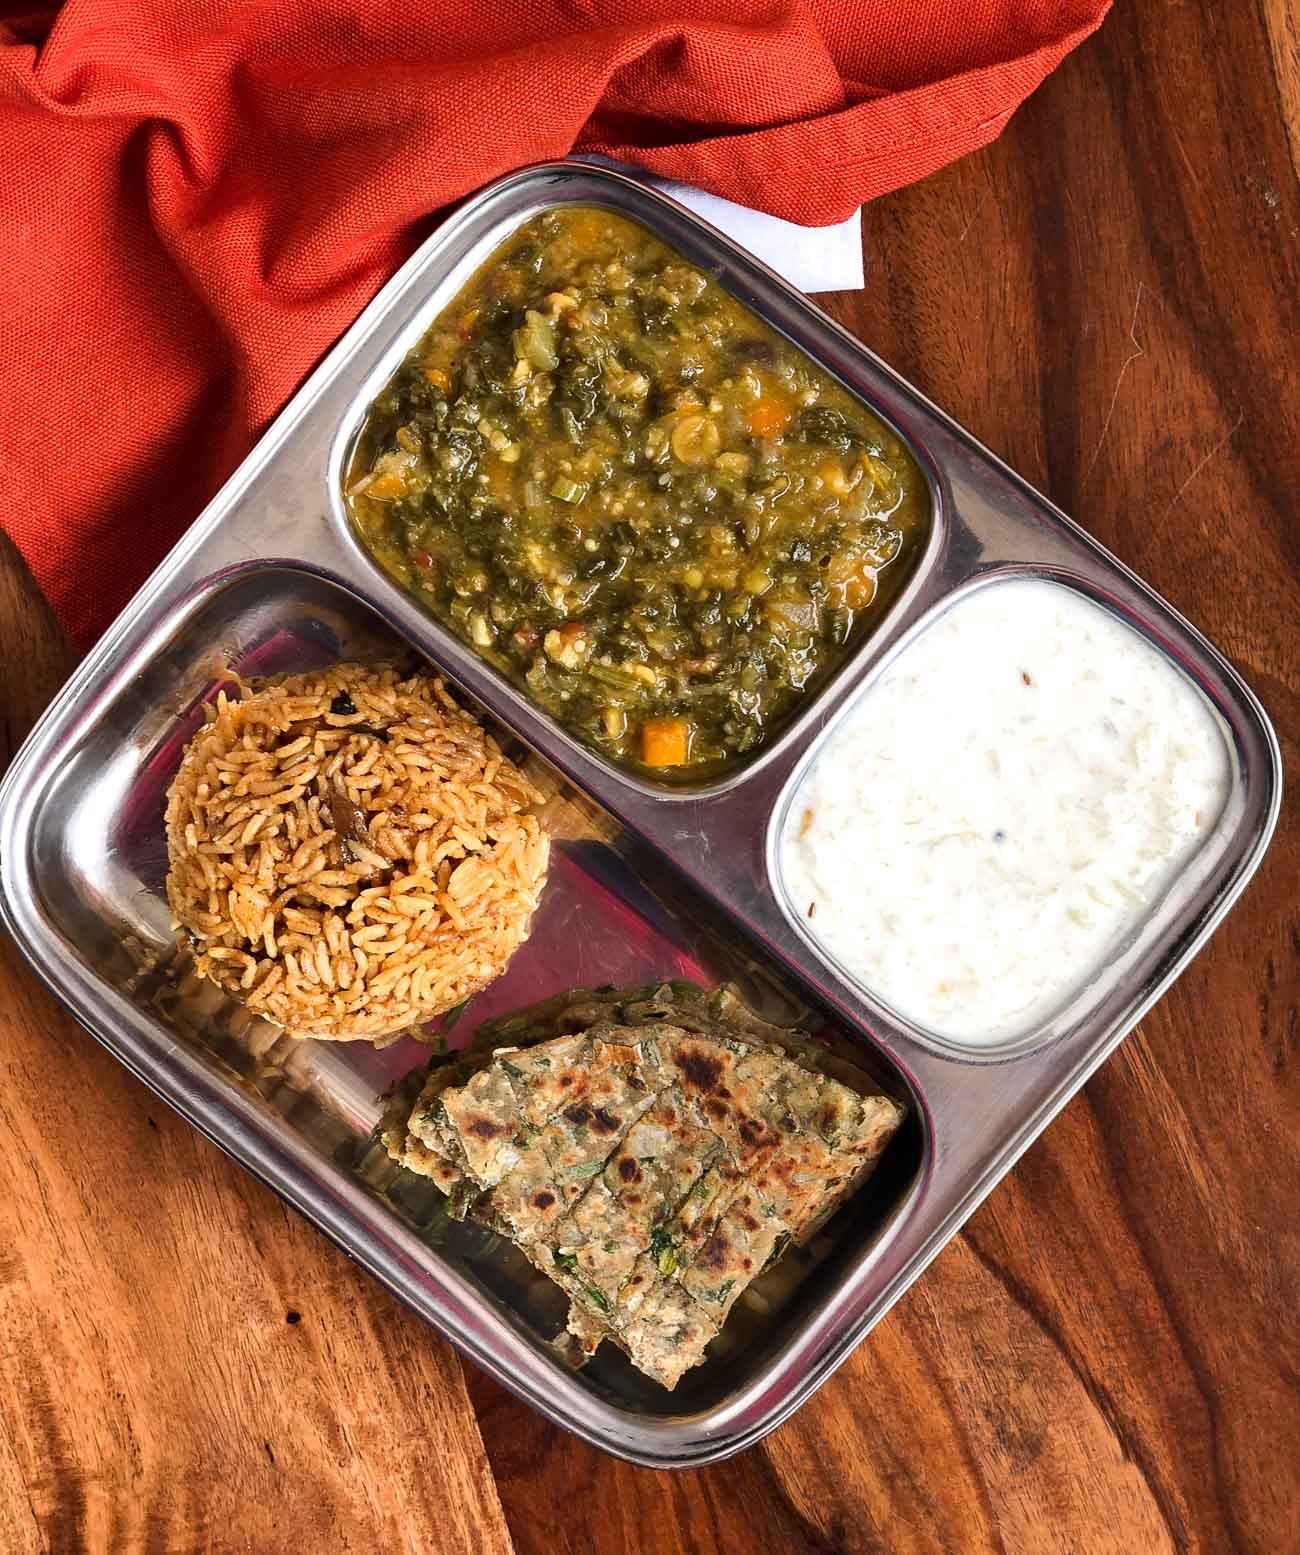 Portion Control Meal Plate Sai Bhaji Lauki Raita Koki Roti u0026 Bhuga Chawal & Portion Control Meal Plate: Sai Bhaji Lauki Raita Koki Roti ...